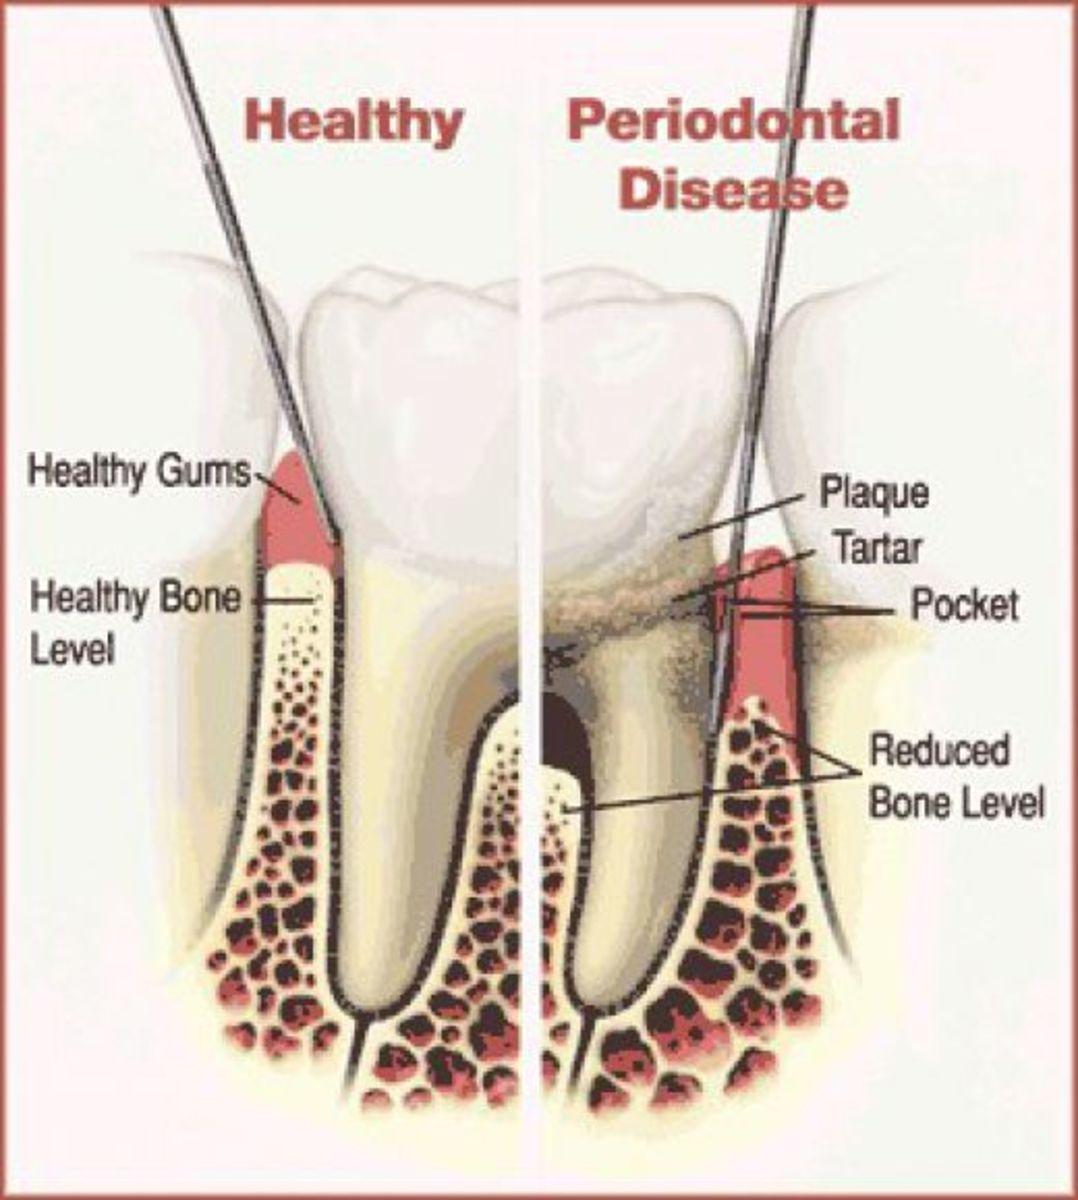 Periodontal disease destroys the jaw bone